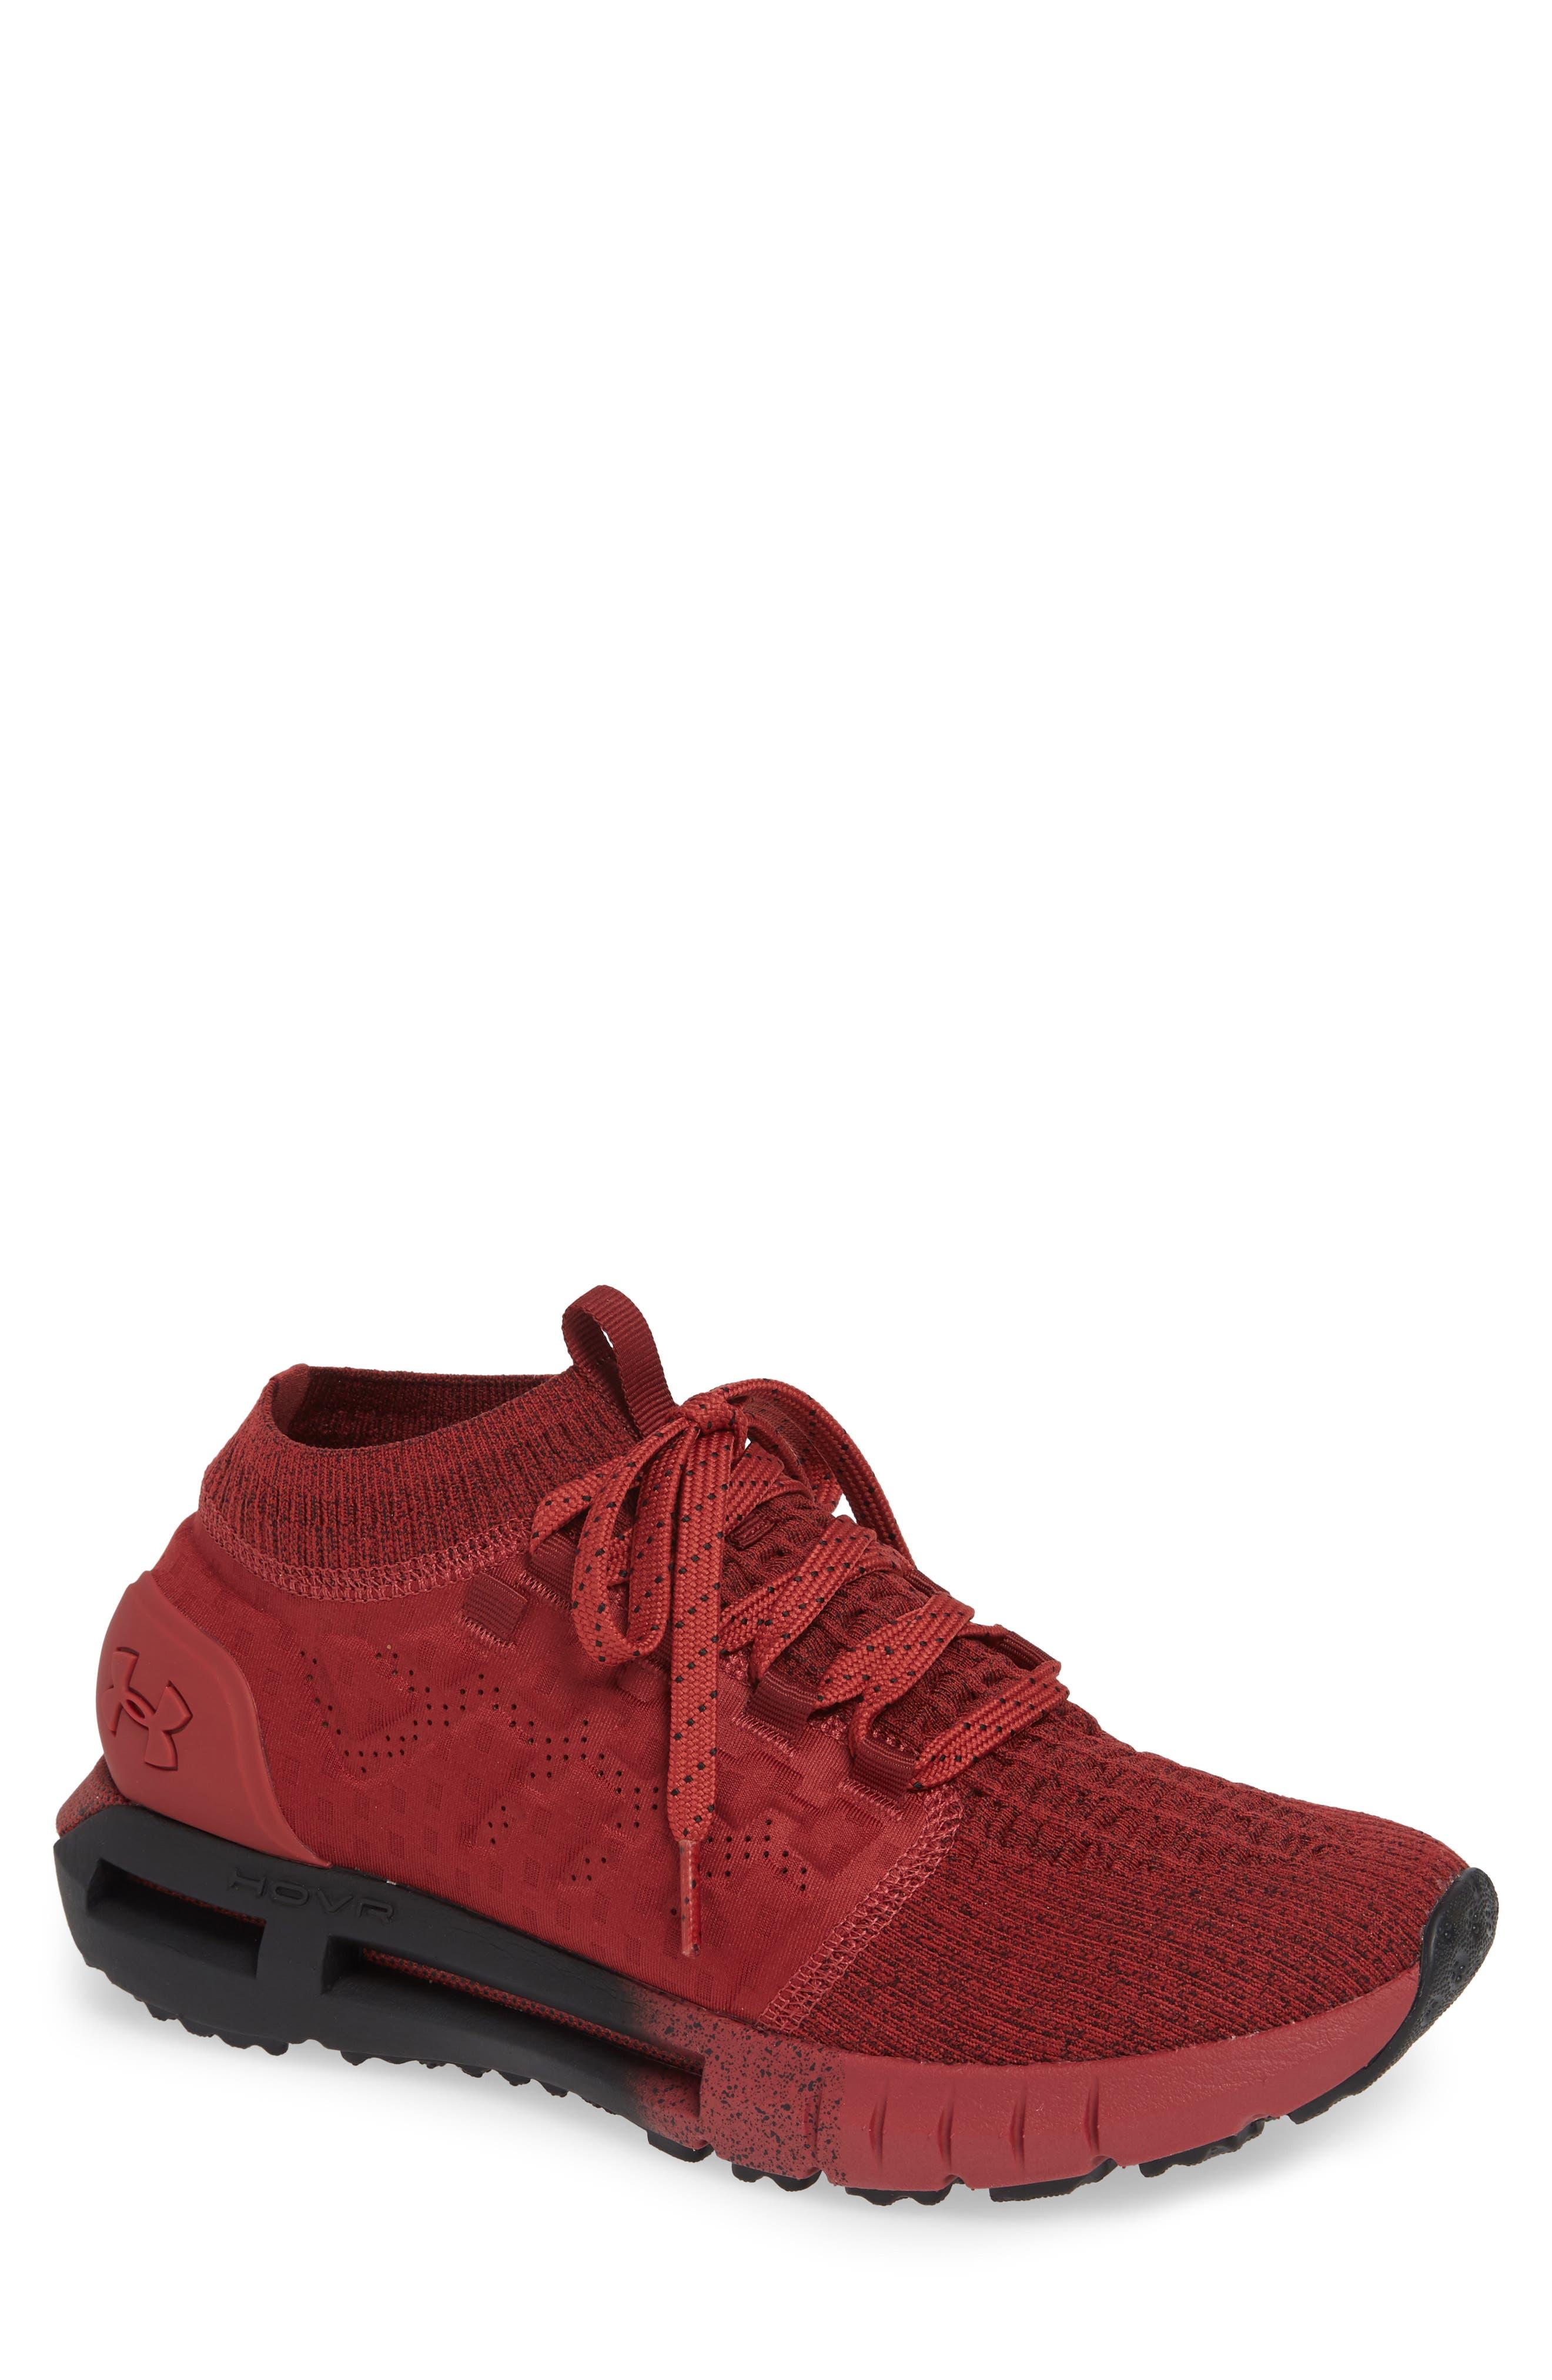 HOVR Phantom NC Sneaker,                             Main thumbnail 1, color,                             602